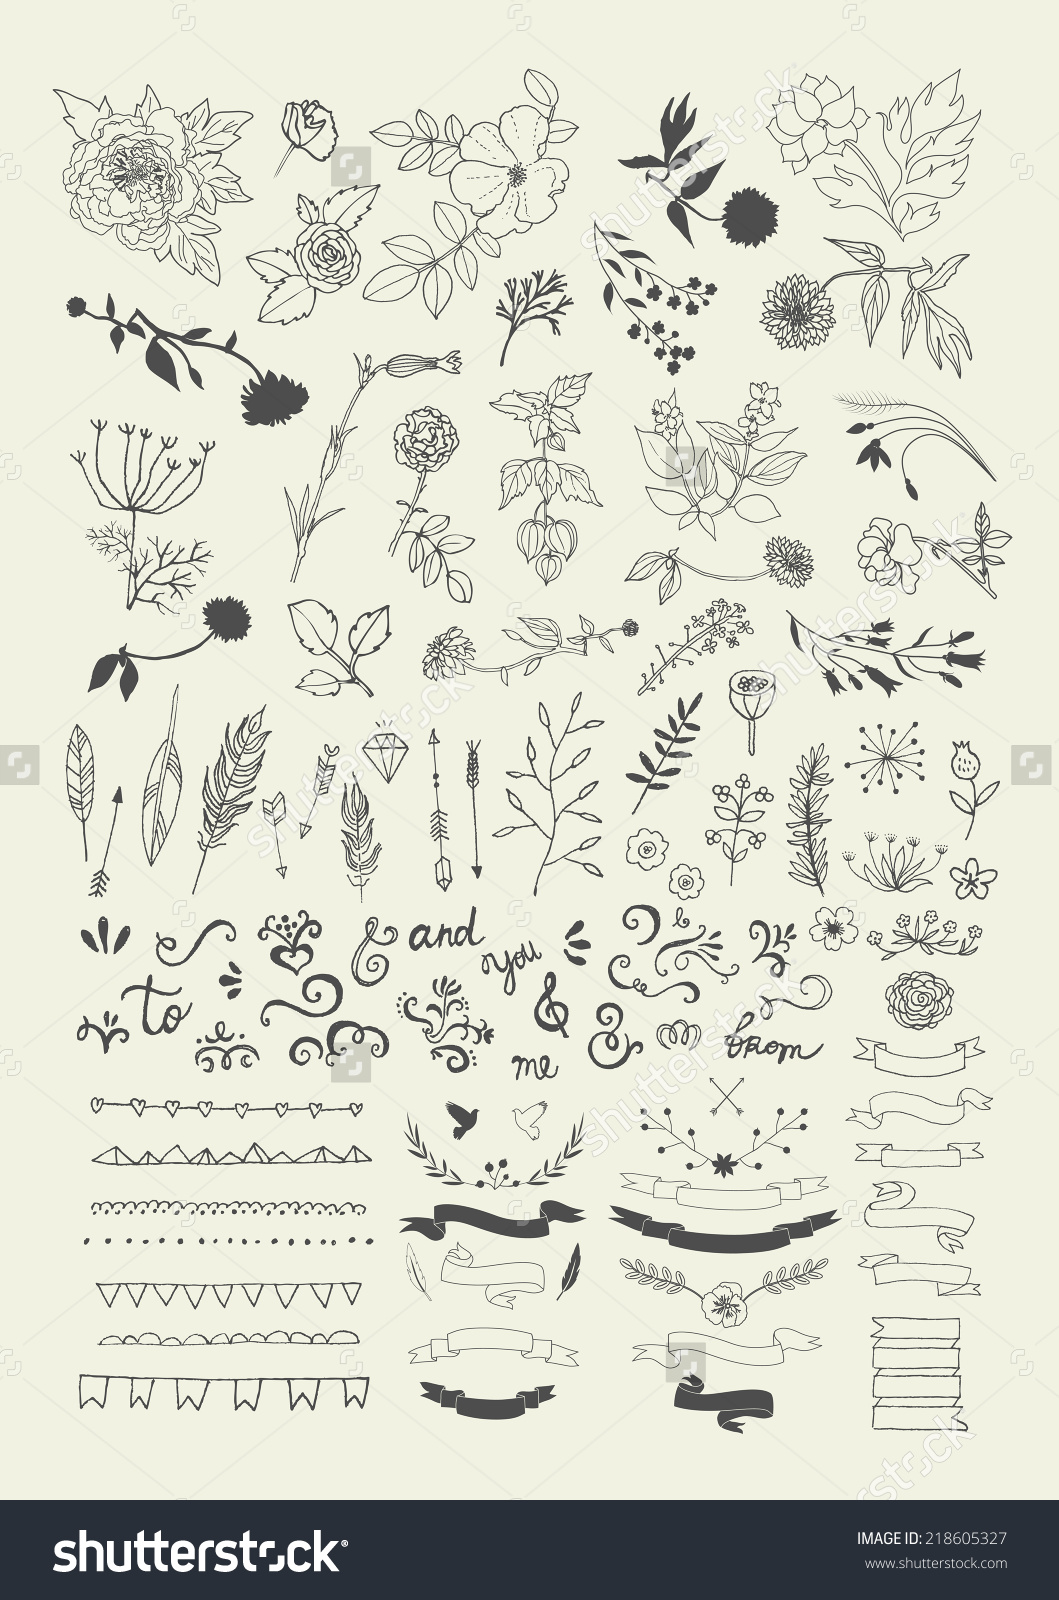 1059x1600 Hand Drawn Vintage Floral Elements. Swirls, Laurels, Frames